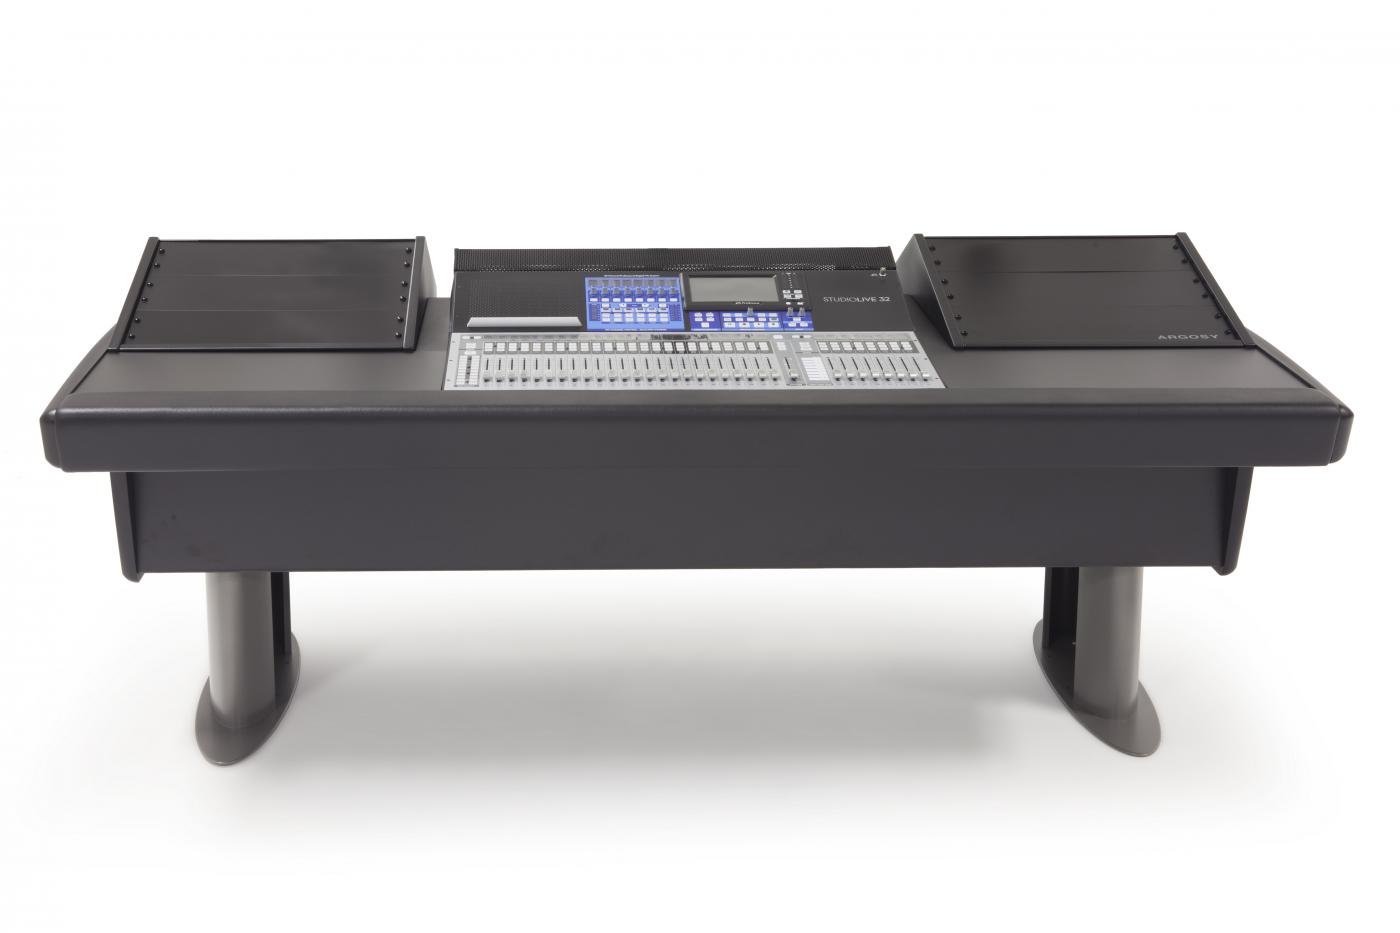 argosy console studio furniture. Black Bedroom Furniture Sets. Home Design Ideas